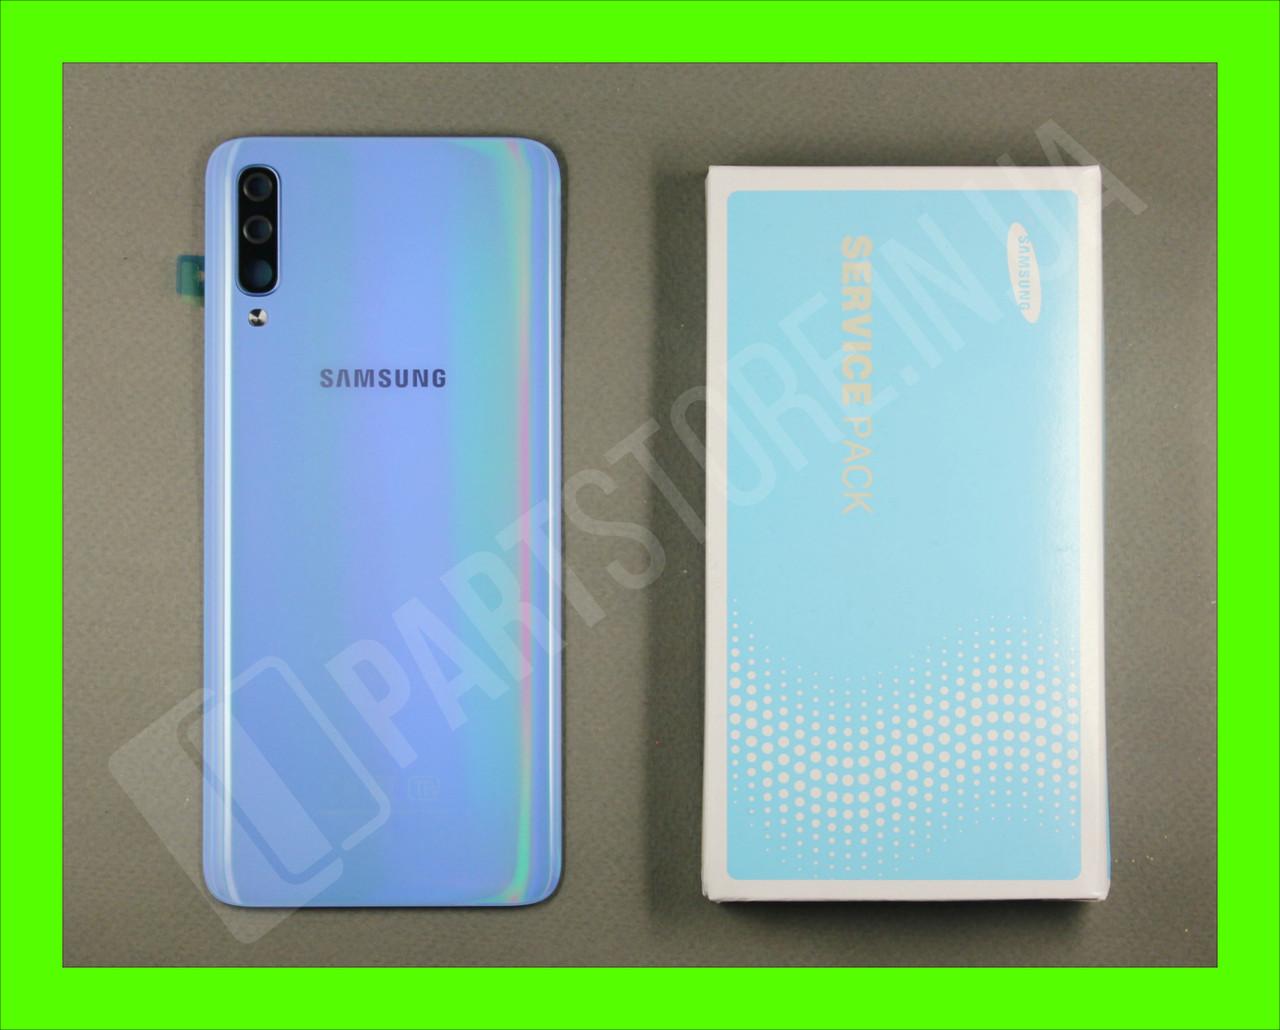 Cервисная оригинальная задняя Крышка Samsung A705 Blue A70 2019 (GH82-19664C)